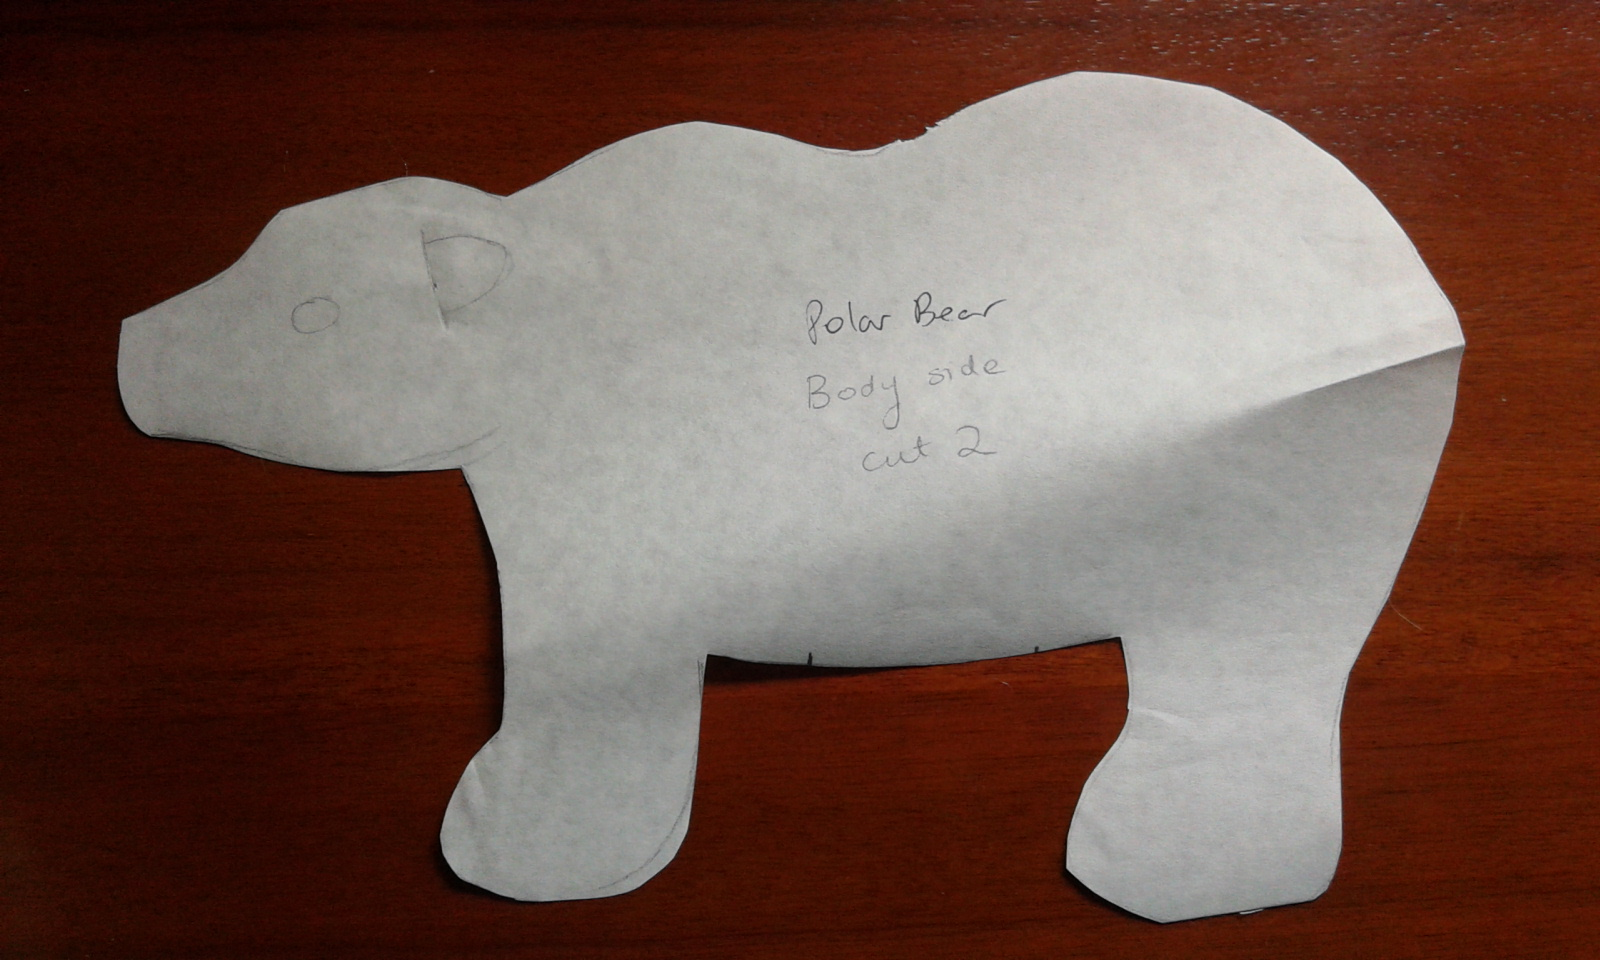 Polar bear sewing pattern gallery craft decoration ideas polar bear sewing pattern images craft decoration ideas polar bear sewing pattern image collections craft decoration jeuxipadfo Images